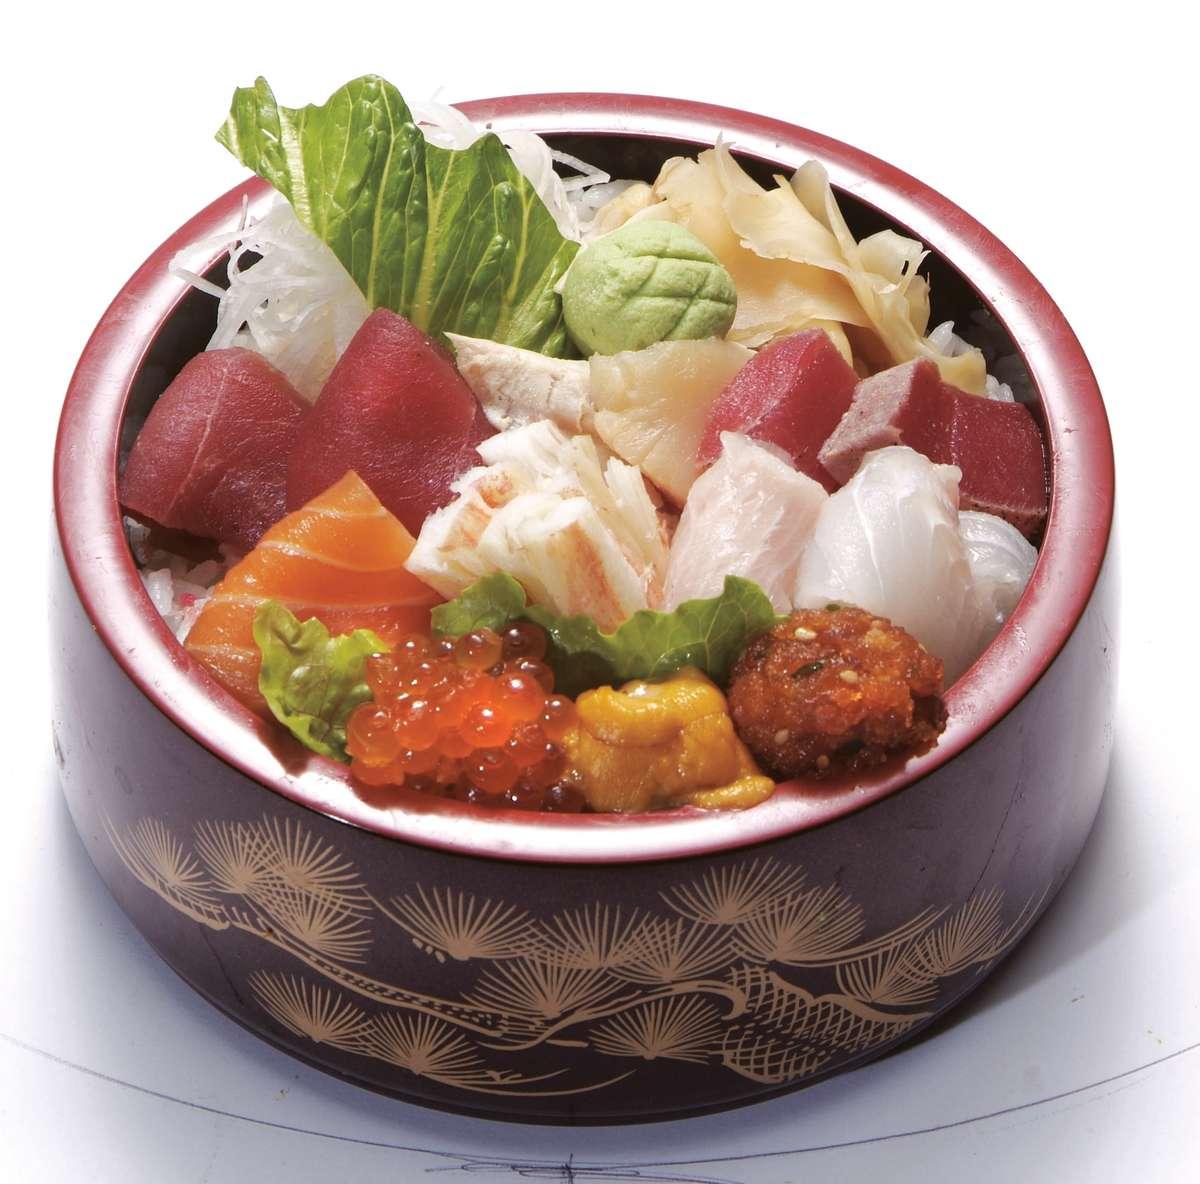 Chirashi lunch